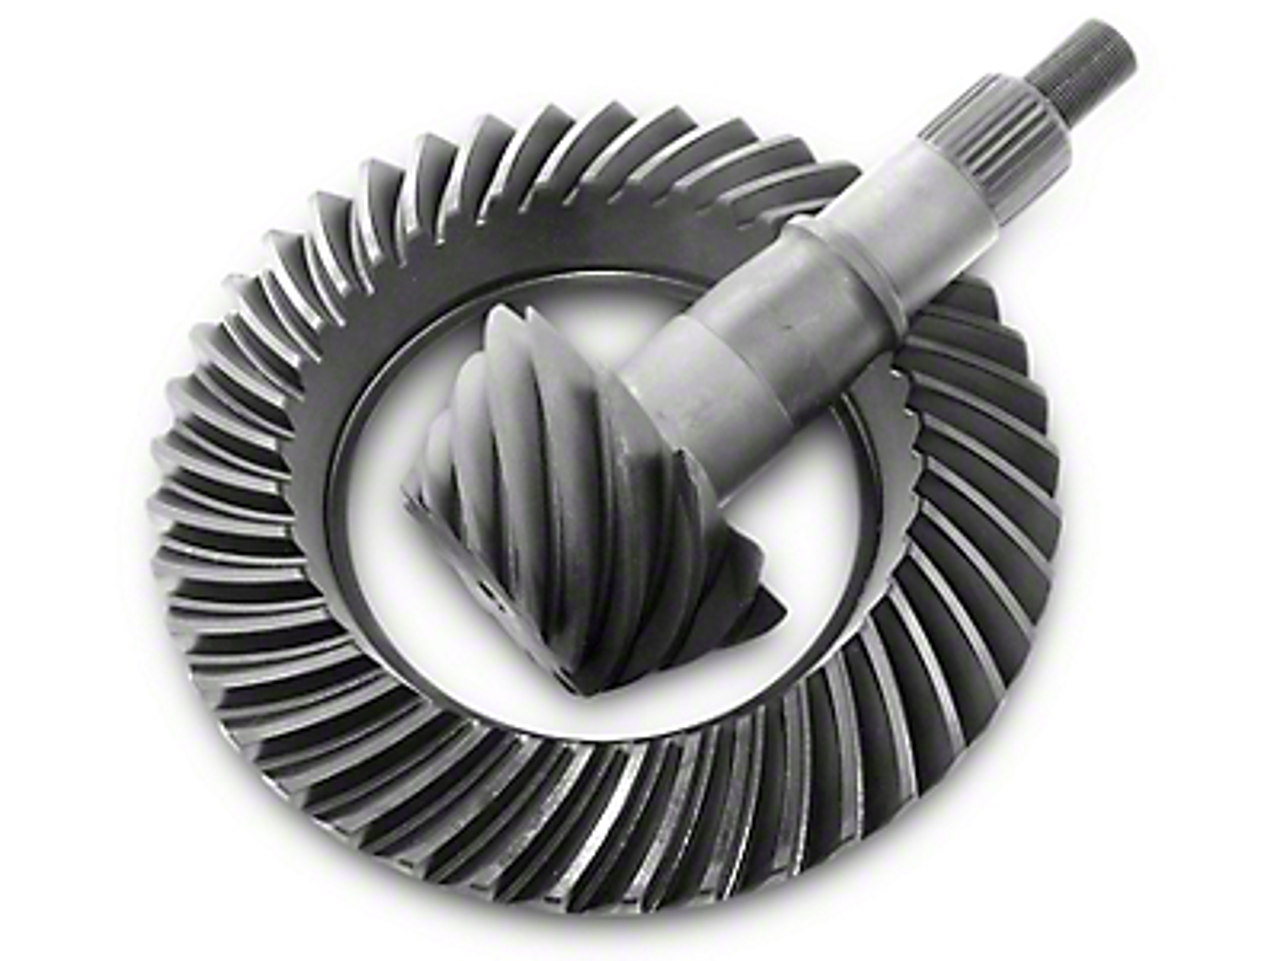 Richmond 8.8 in. 4.56 Gears (11-14 V6)